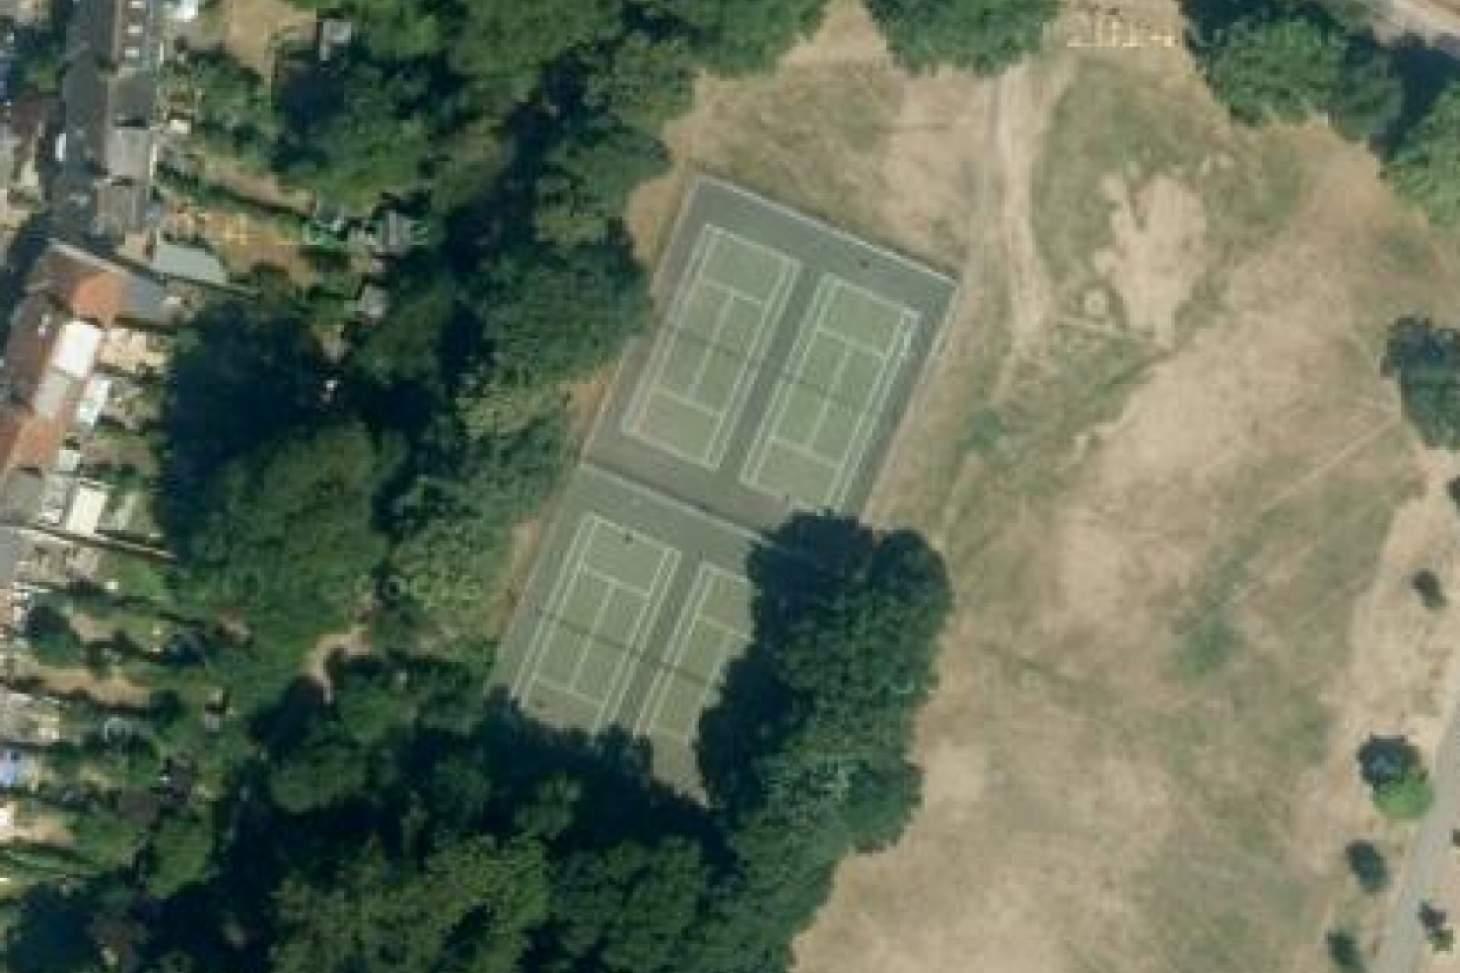 Palewell Common Outdoor | Hard (macadam) tennis court